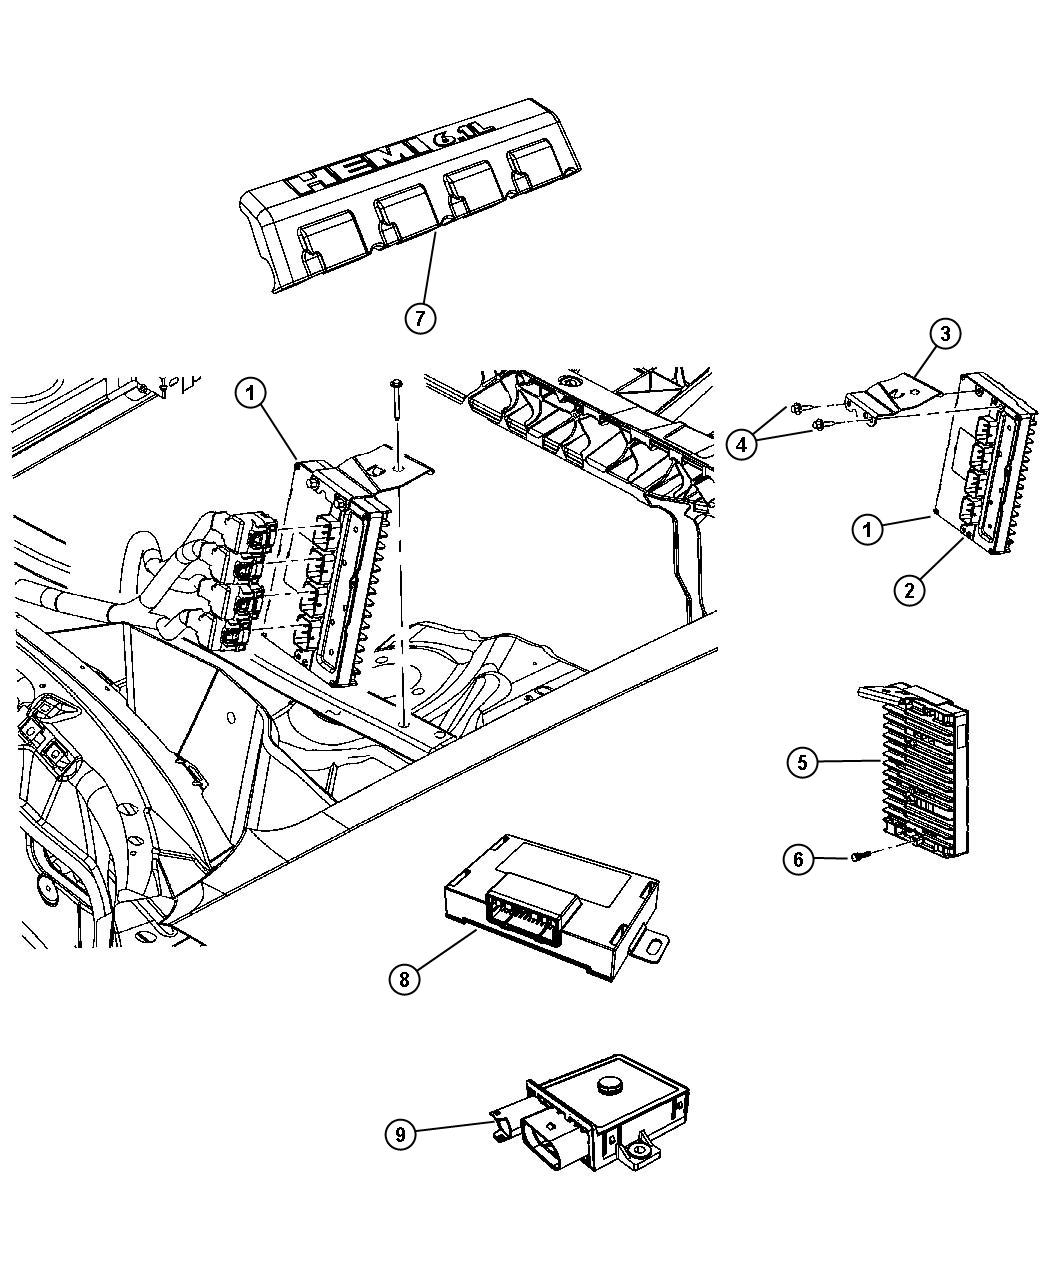 2009 Dodge Sprinter 2500 Module. Glow plug. Plugs, engine